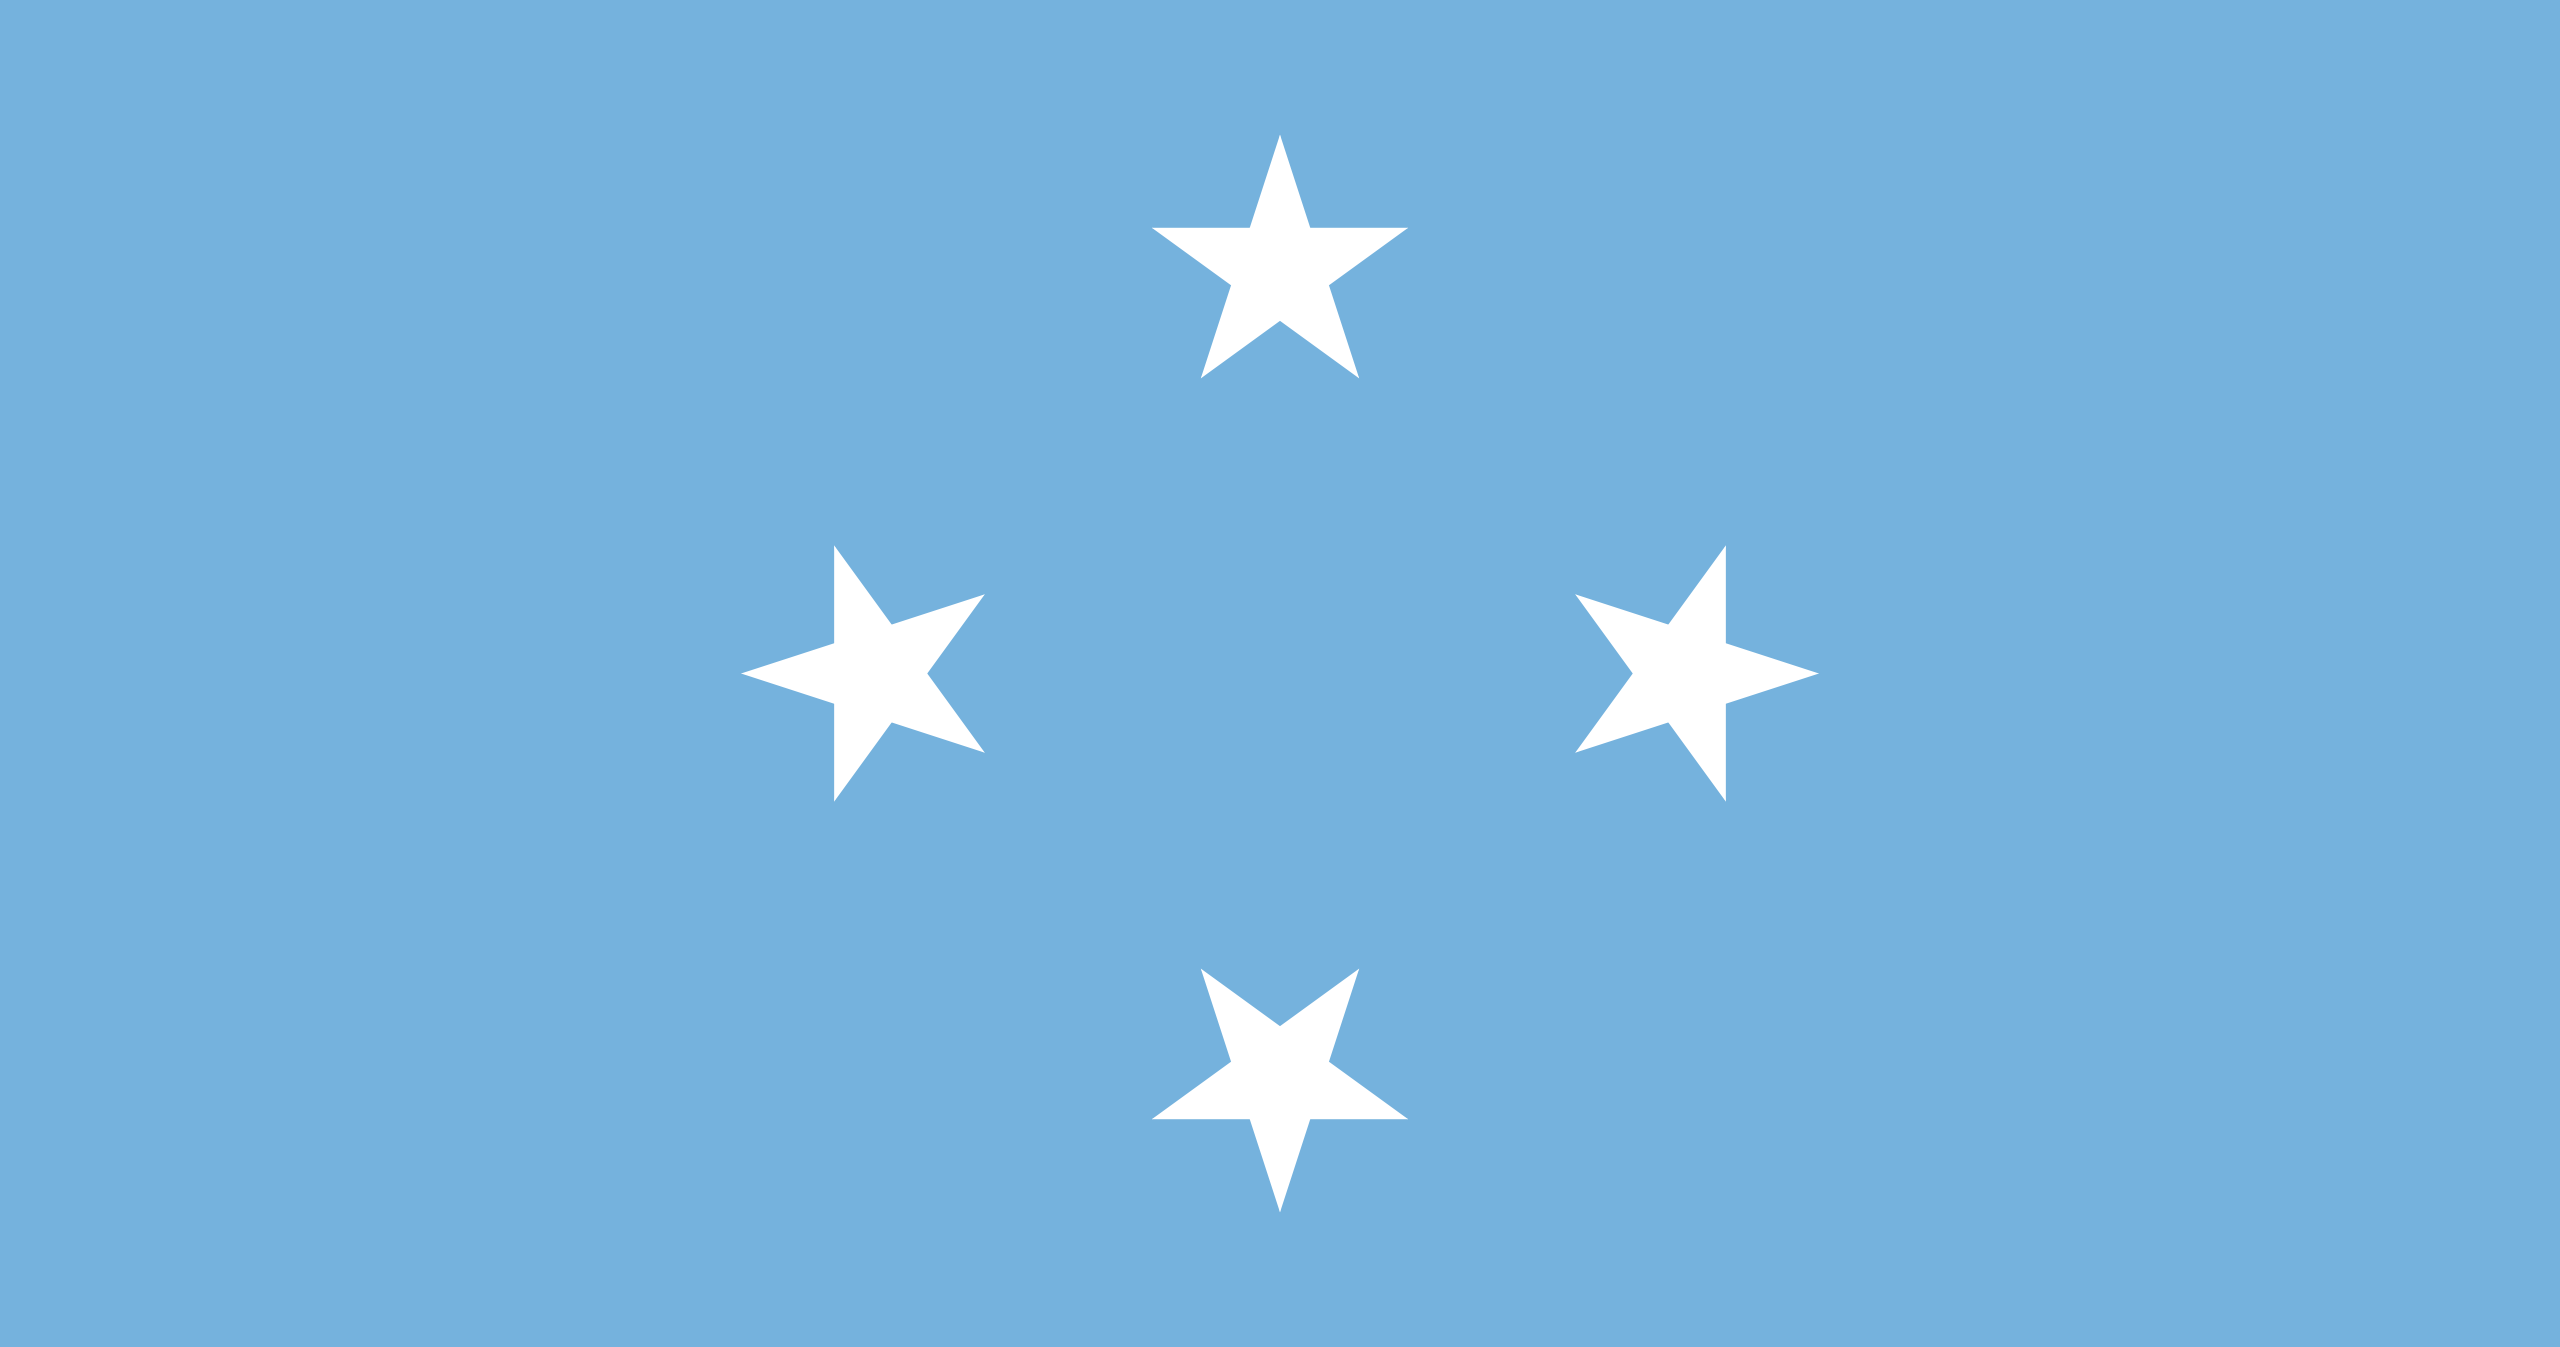 micronesia, paese, emblema, logo, simbolo - Sfondi HD - Professor-falken.com